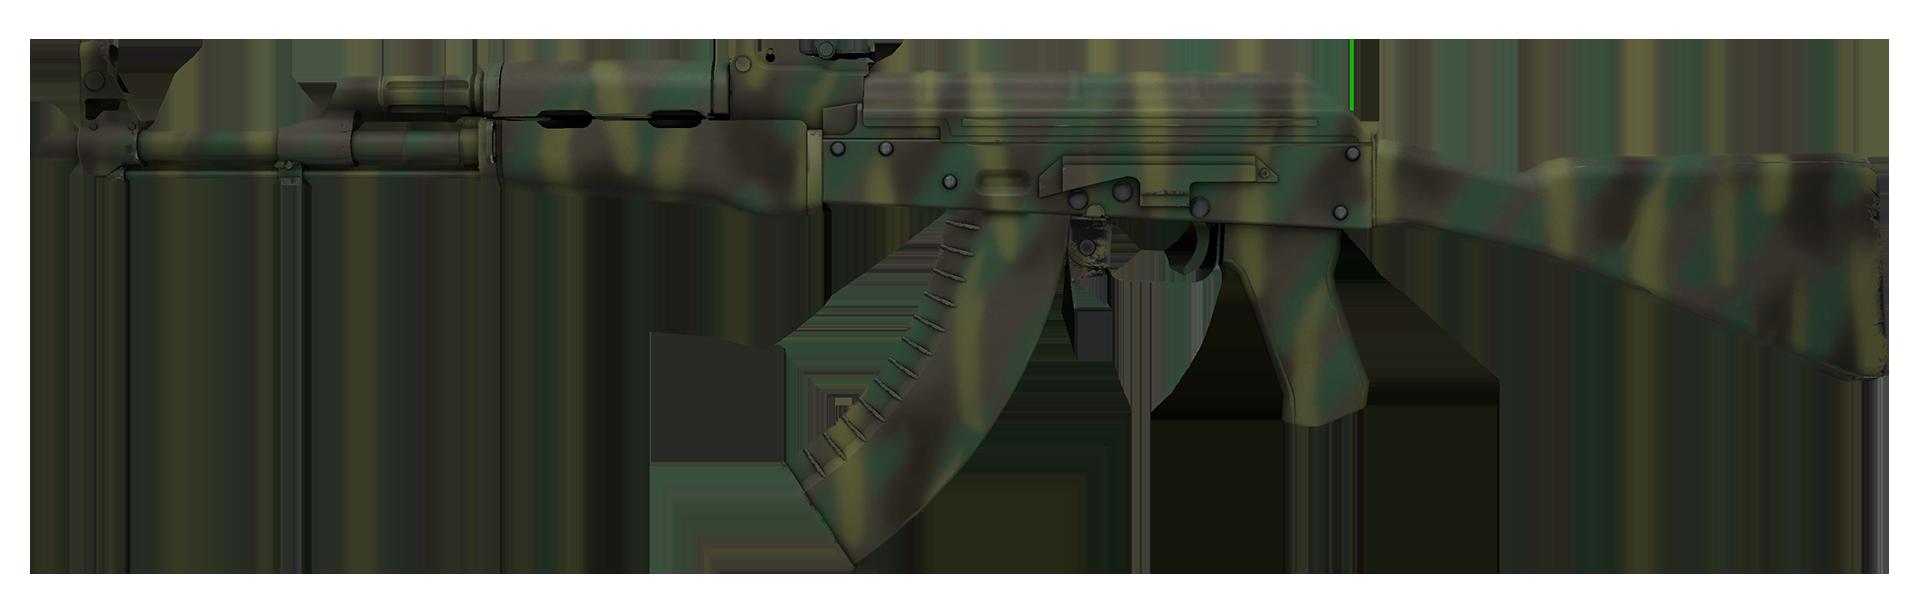 AK-47 Jungle Spray Large Rendering